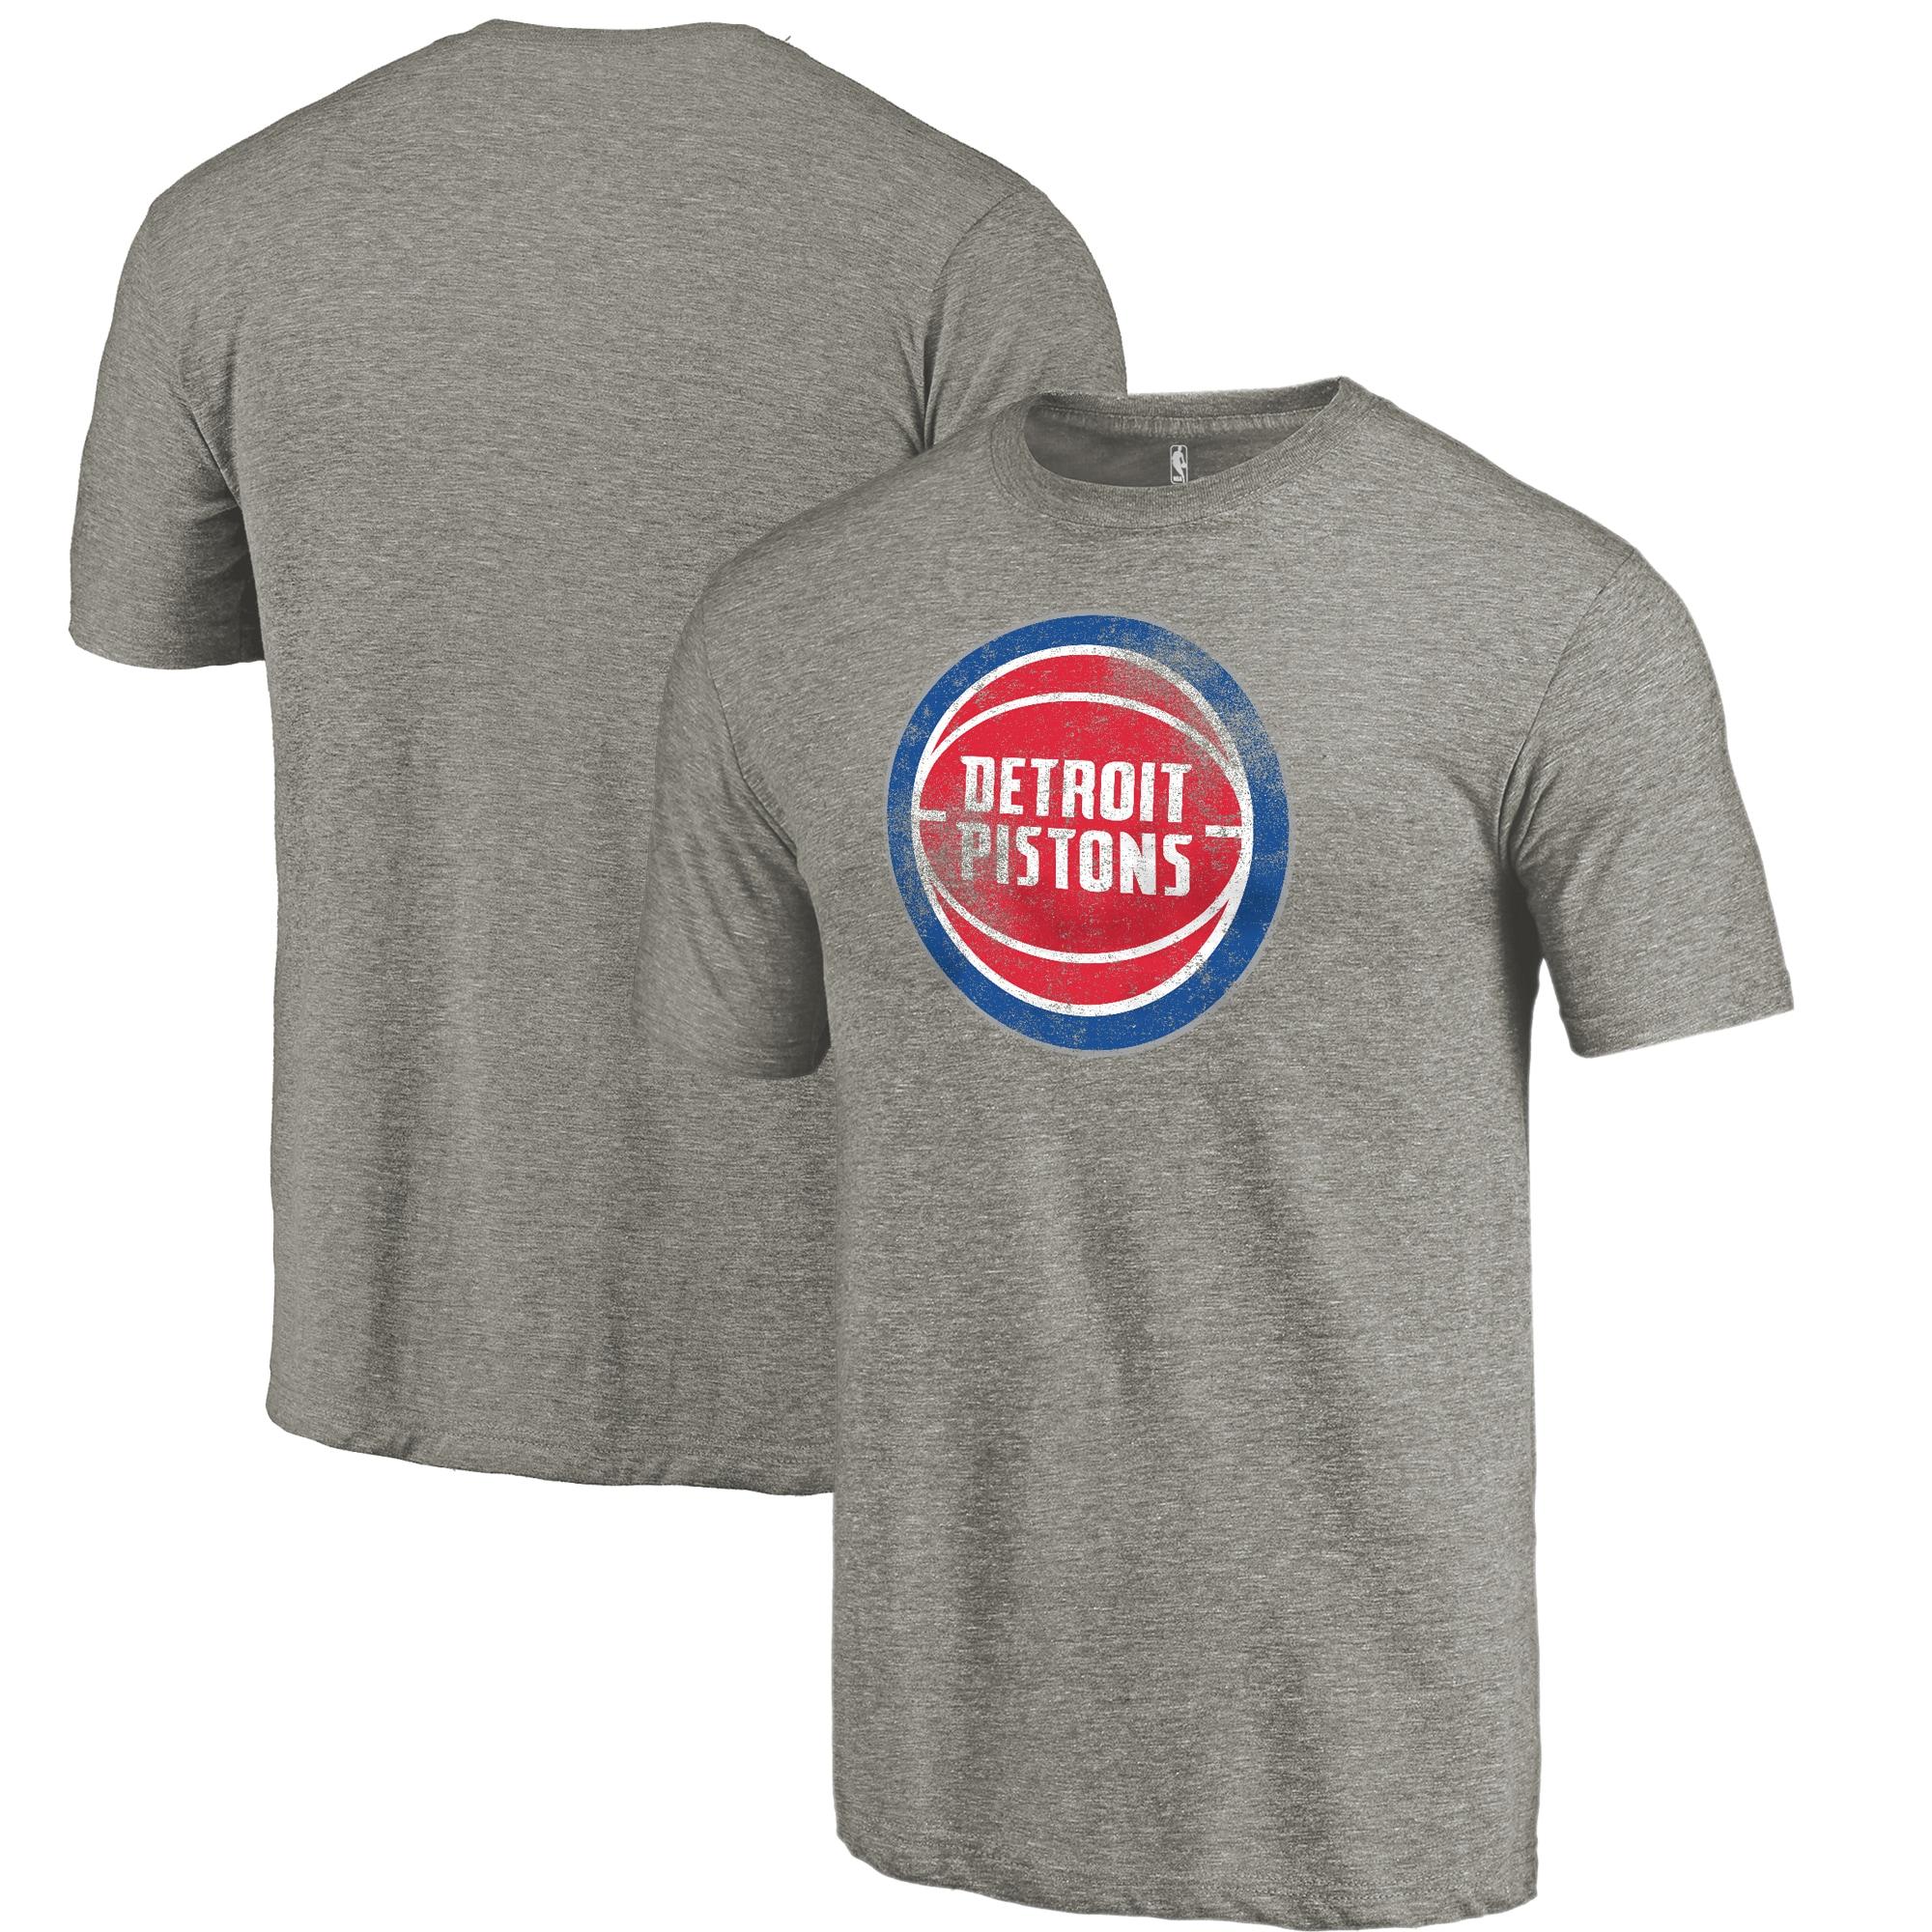 Detroit Pistons Fanatics Branded Distressed Team Logo Tri-Blend T-Shirt - Heather Gray